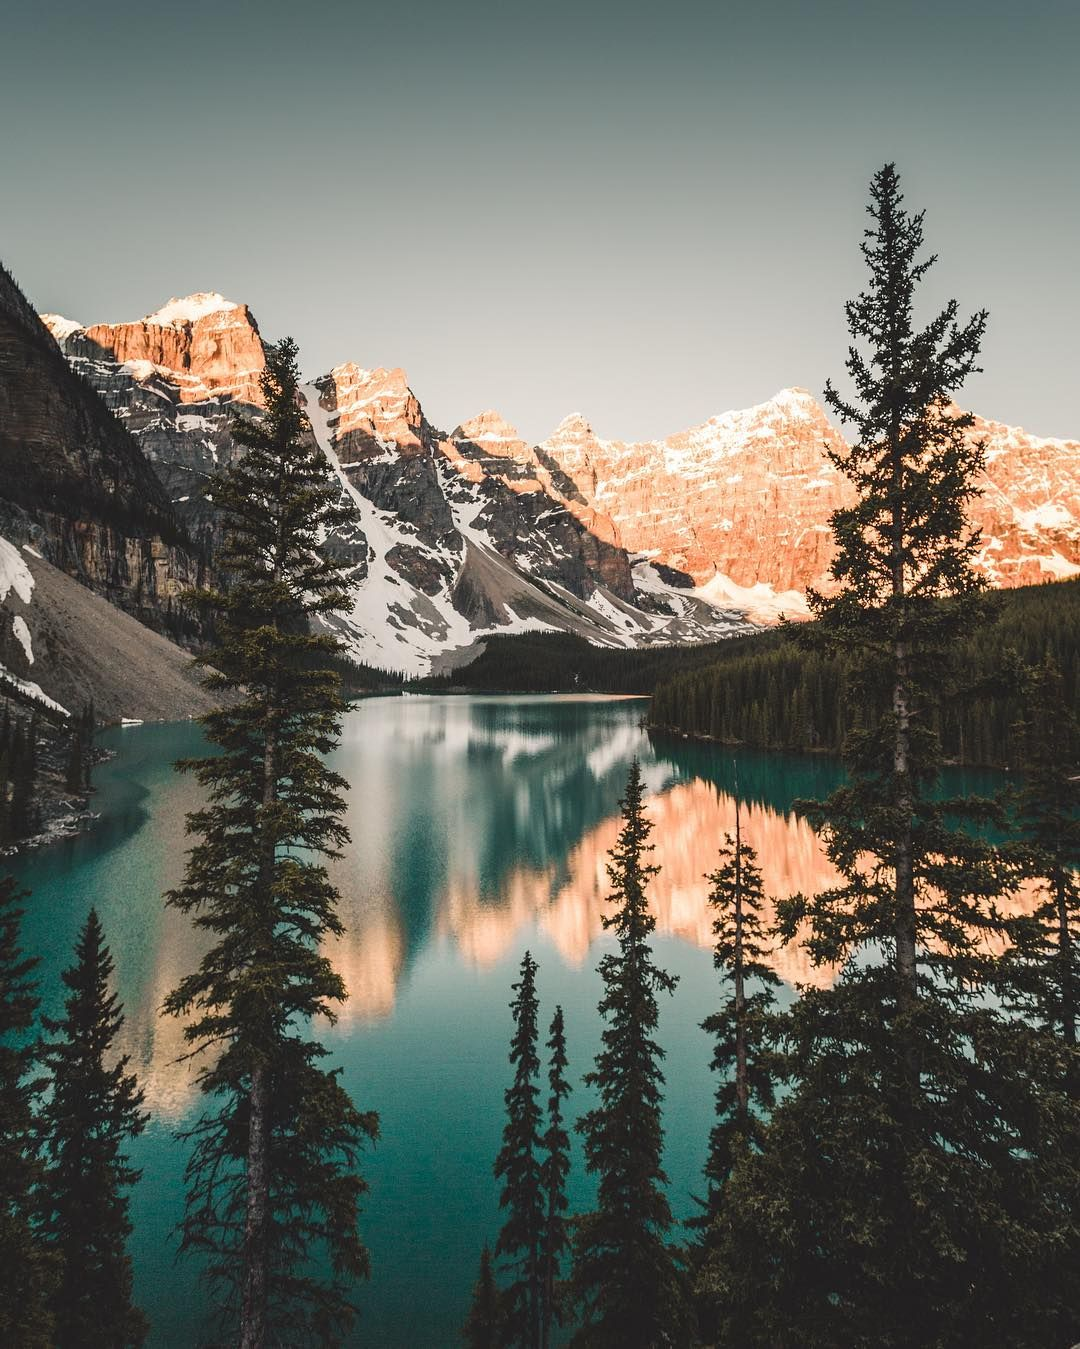 Instatravel Beautiful Landscape Photography By Joe Altwies Nature Photography Beautiful Landscapes Landscape Photography